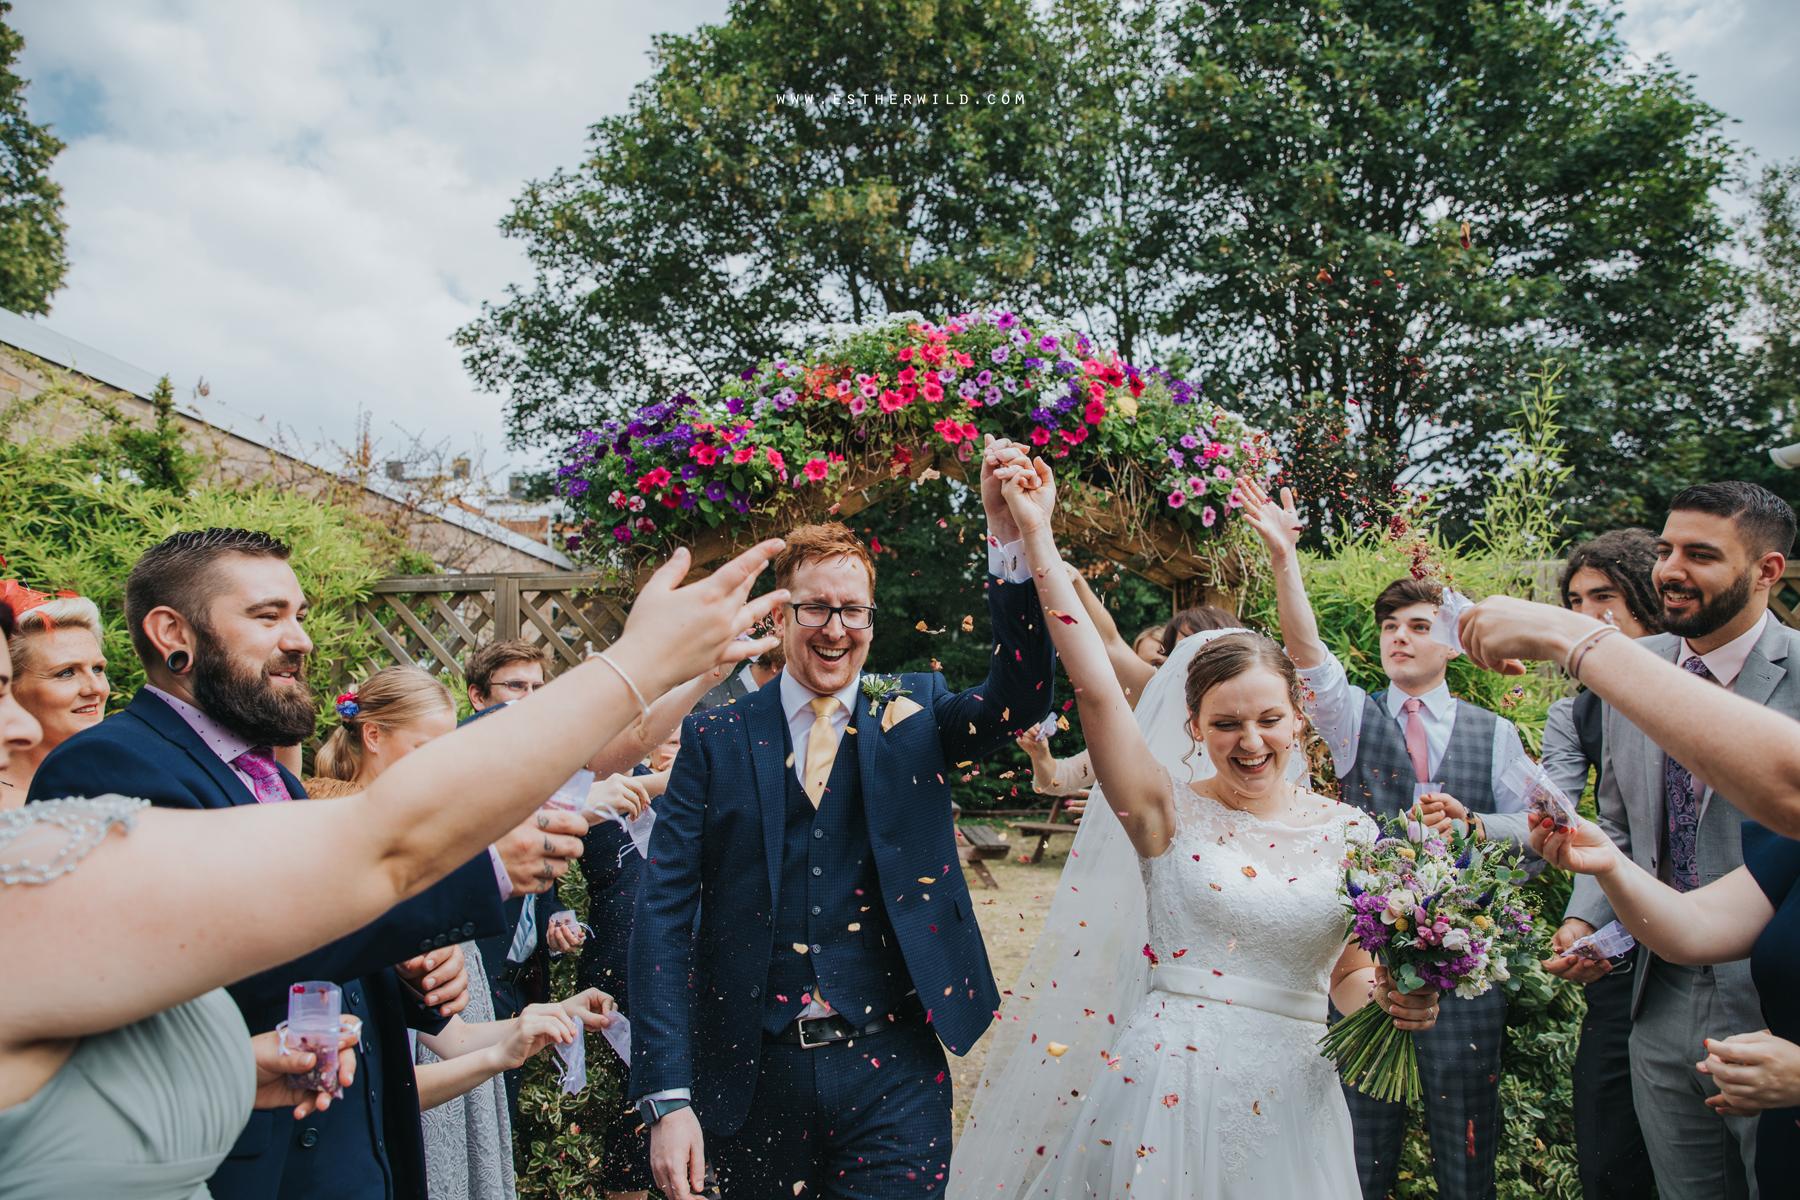 The_Georgian_Townhouse_Wedding_Norwich_Esther_Wild_Photographer_3R8A1320.jpg